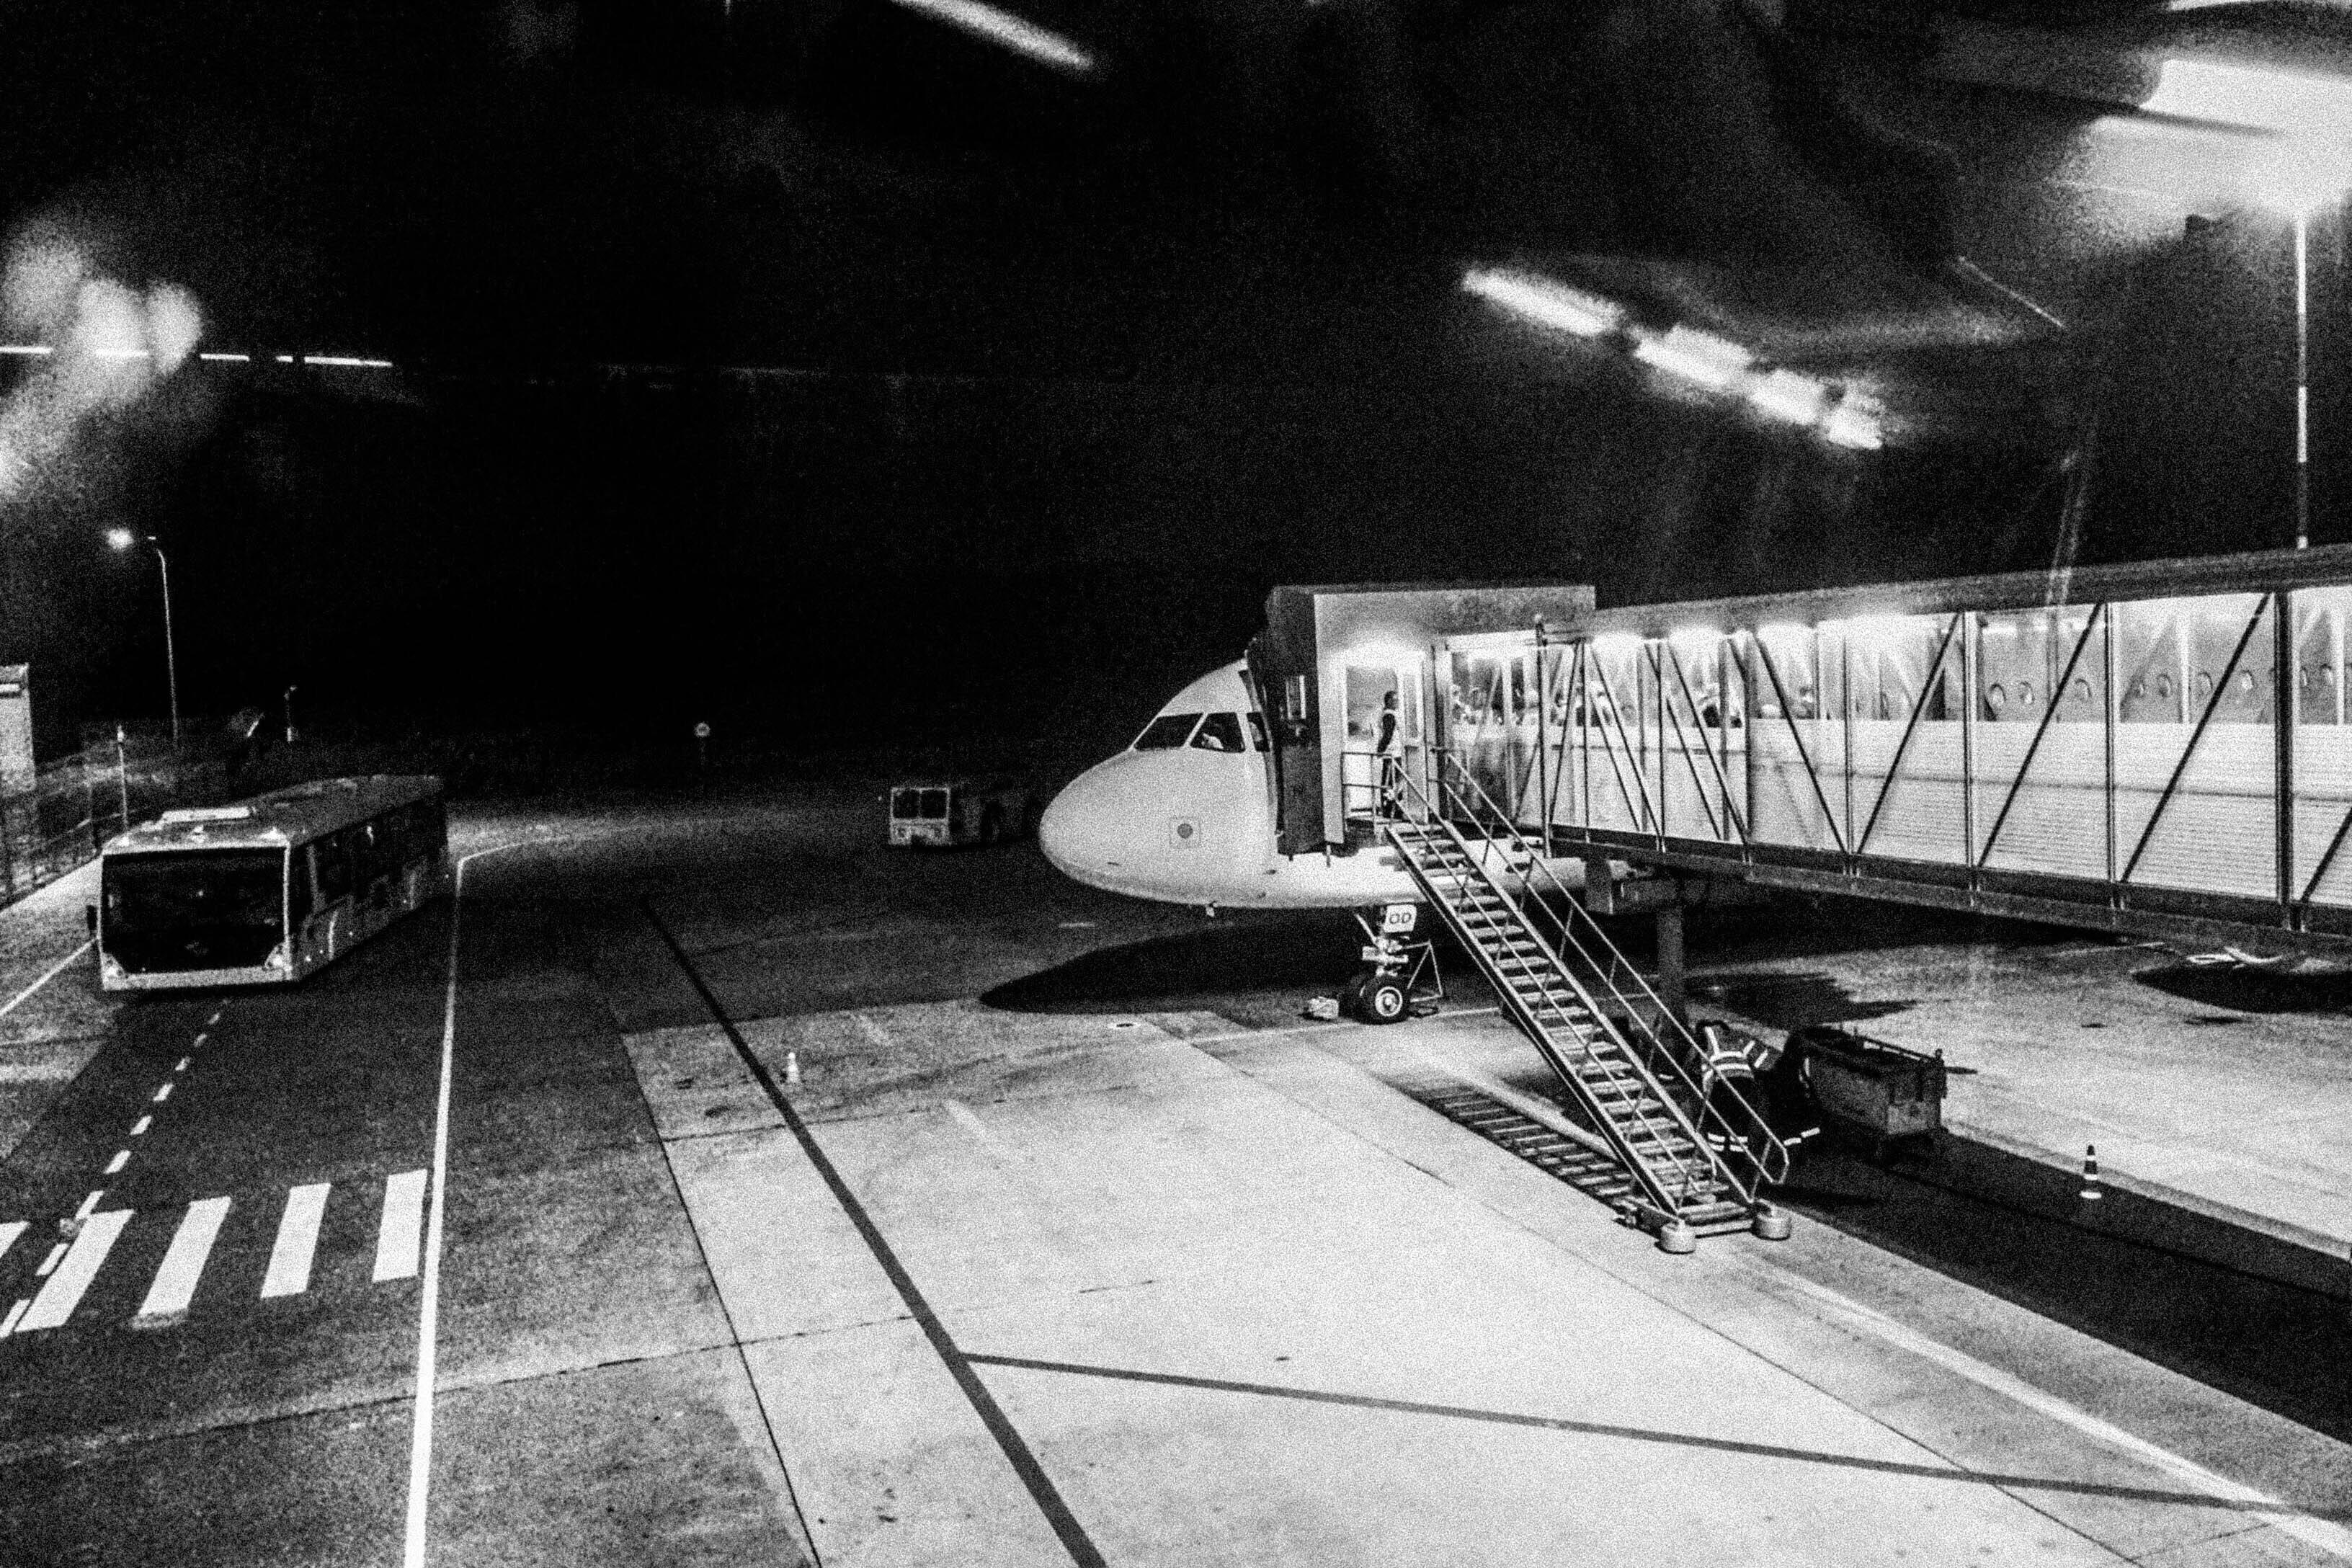 airport_t20_Vo6AK3-163